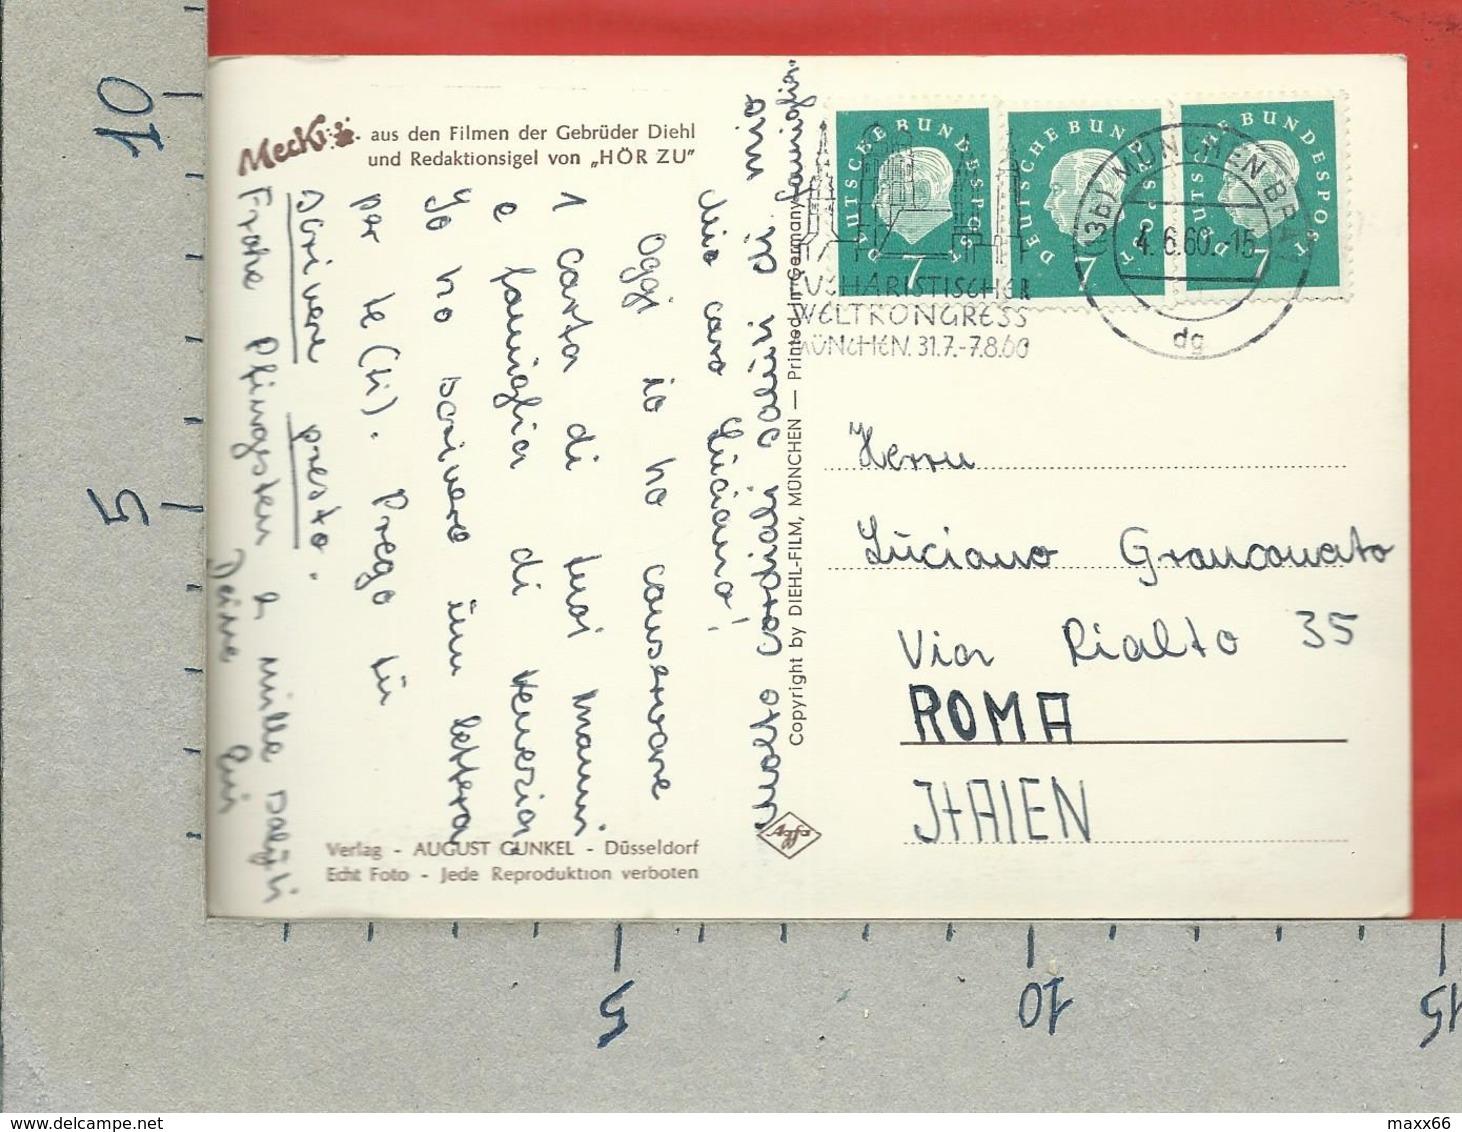 CARTOLINA VG GERMANIA - MECKI - Wann Schreibst Du Mir ? - 10 X 15 - ANN. 1960 - Mecki